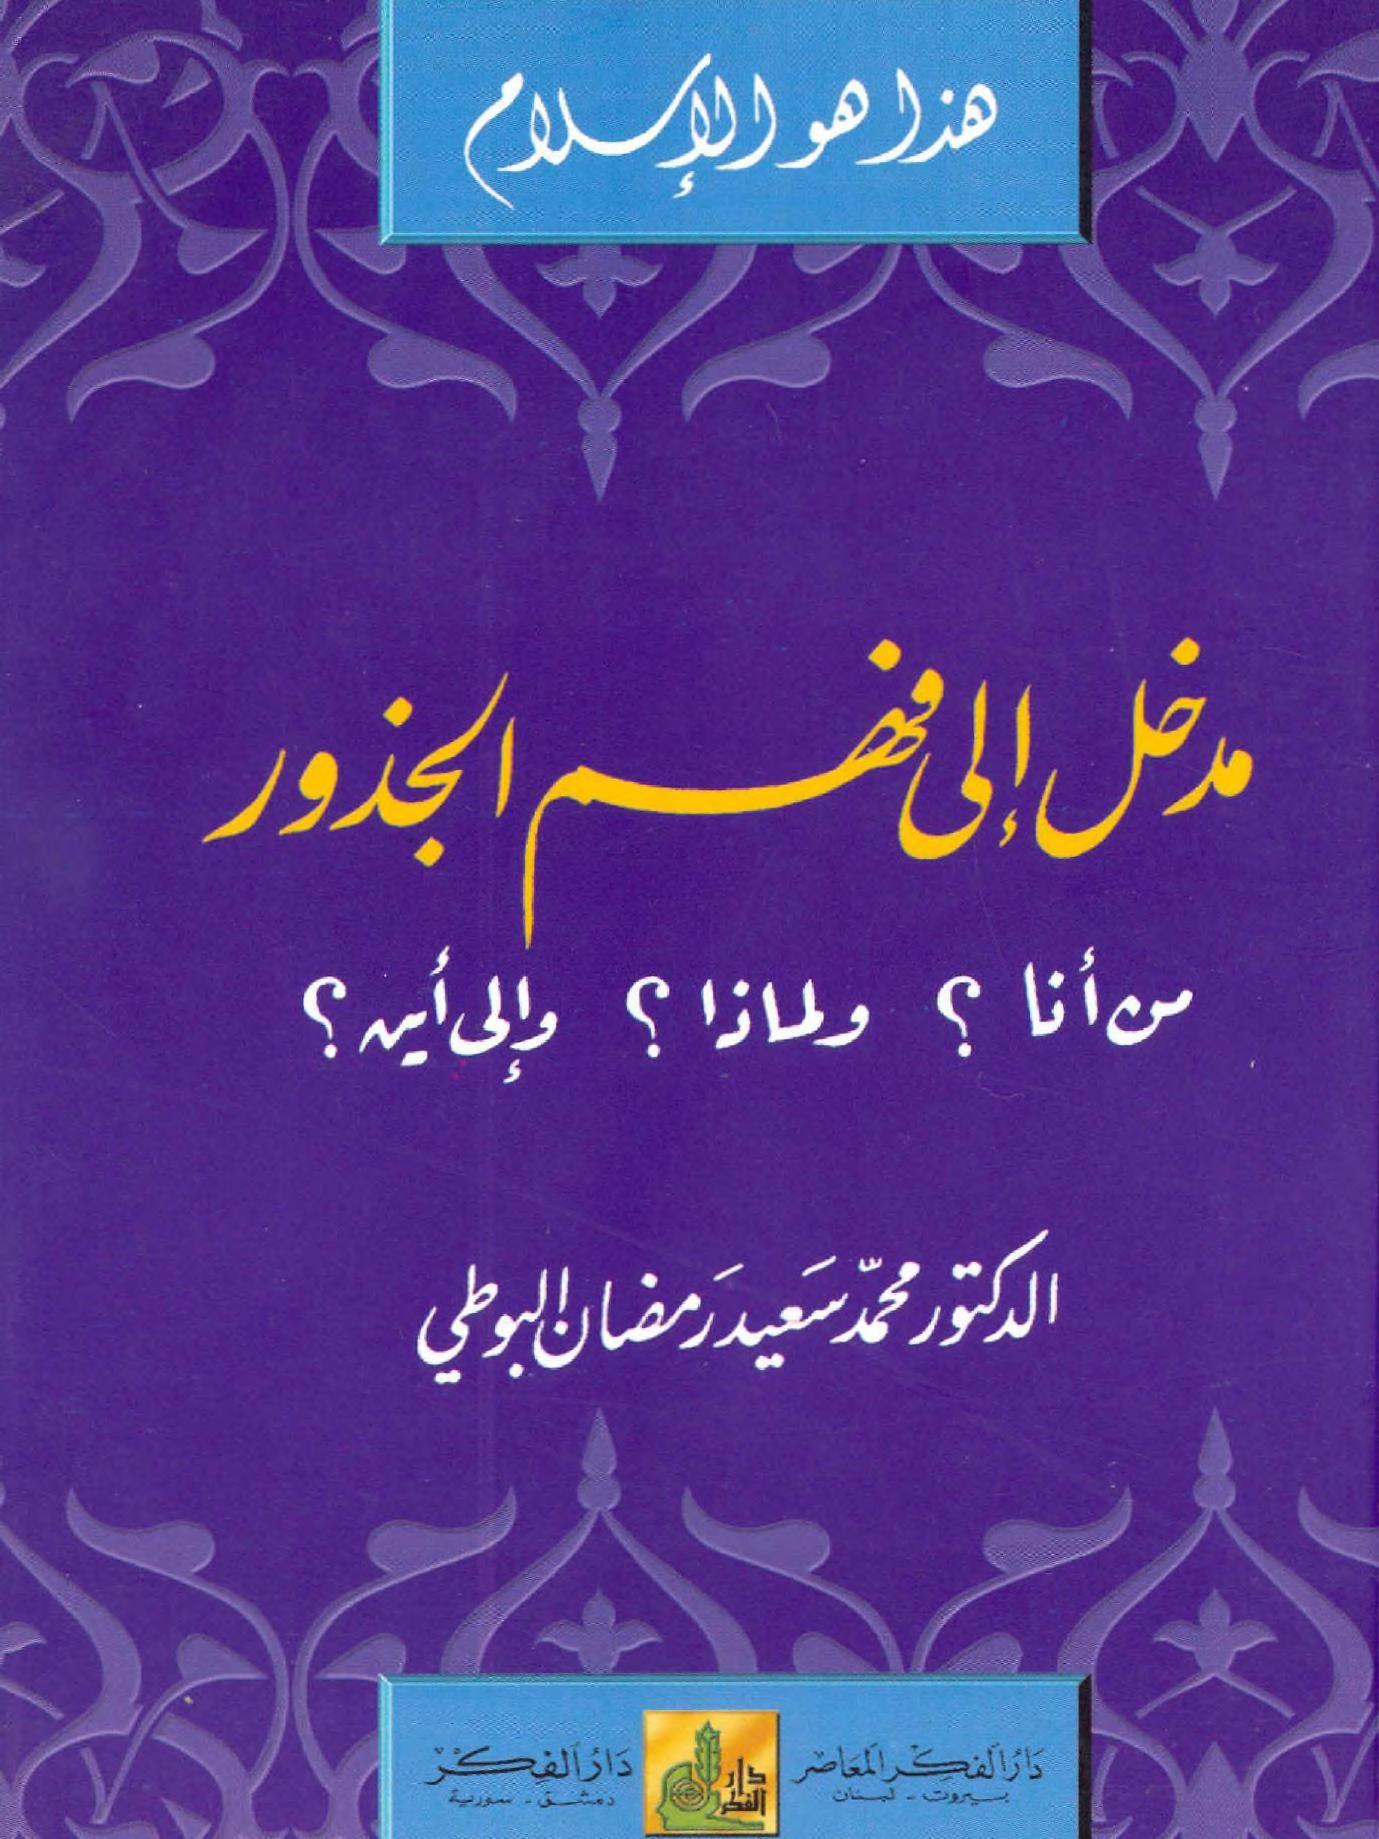 مكتبة محمد سعيد رمضان البوطي رحمه الله Matnawi Free Download Borrow And Streaming Internet Archive Chalkboard Quote Art Chalkboard Quotes Books